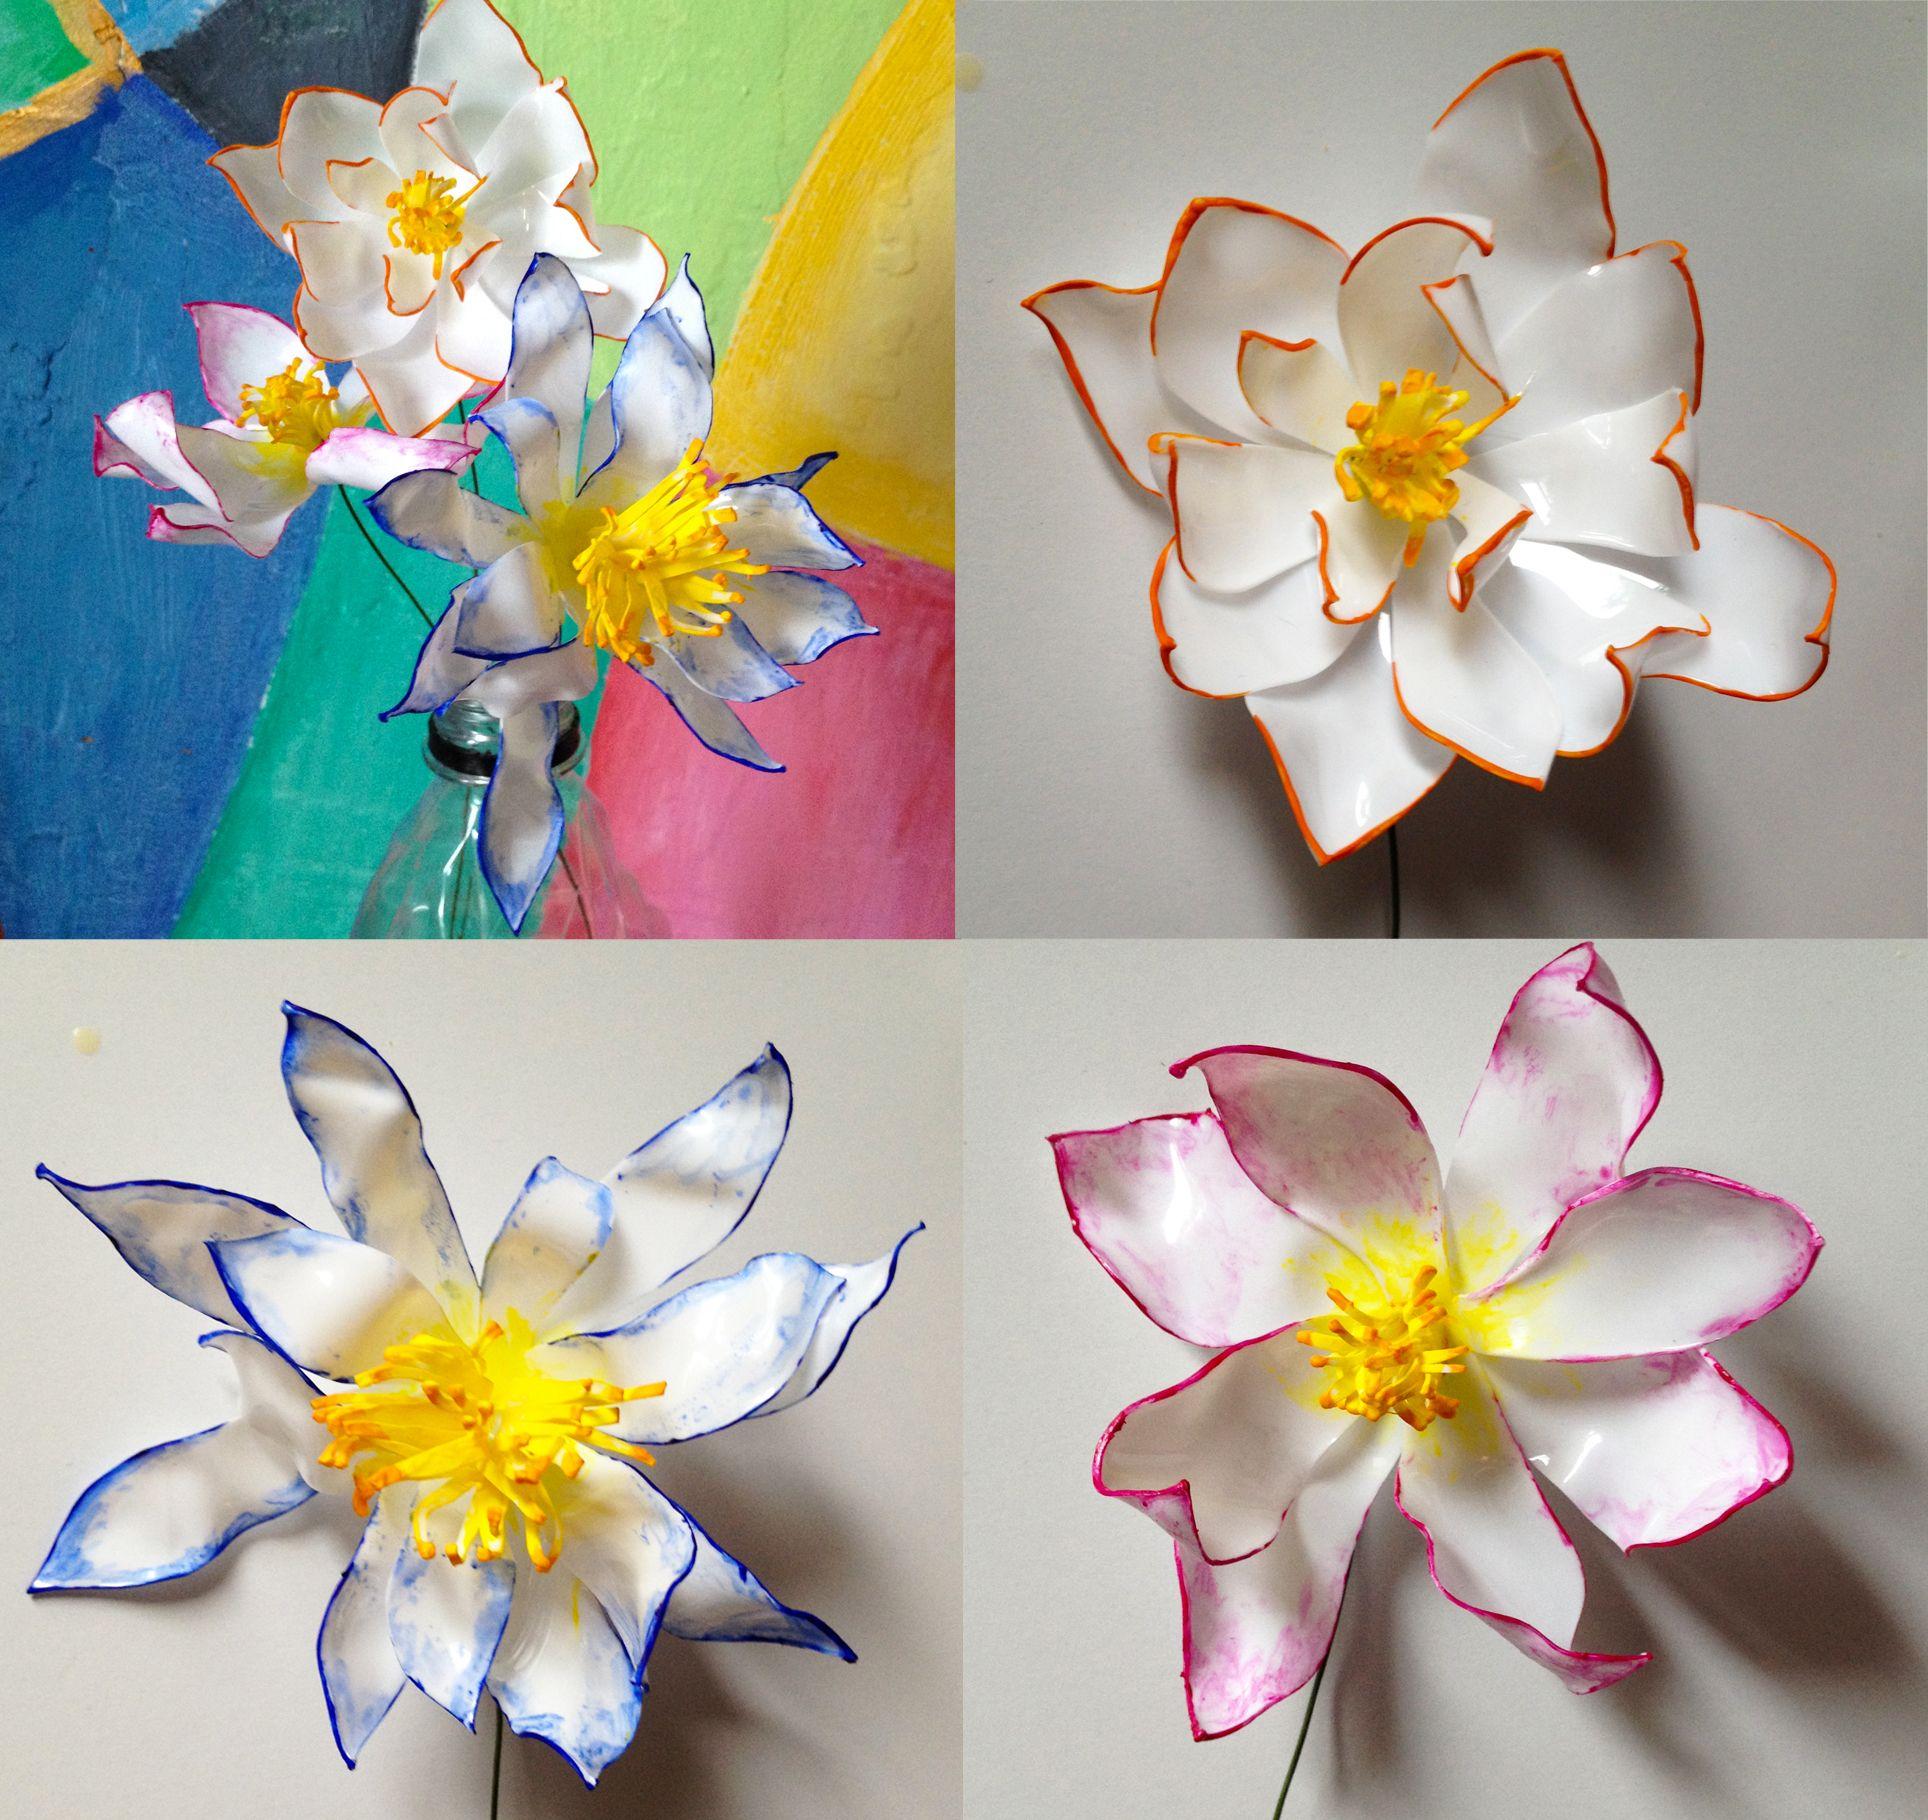 Water Bottle Flowers: Plastic Bottle Flowers + Acrylic Painting